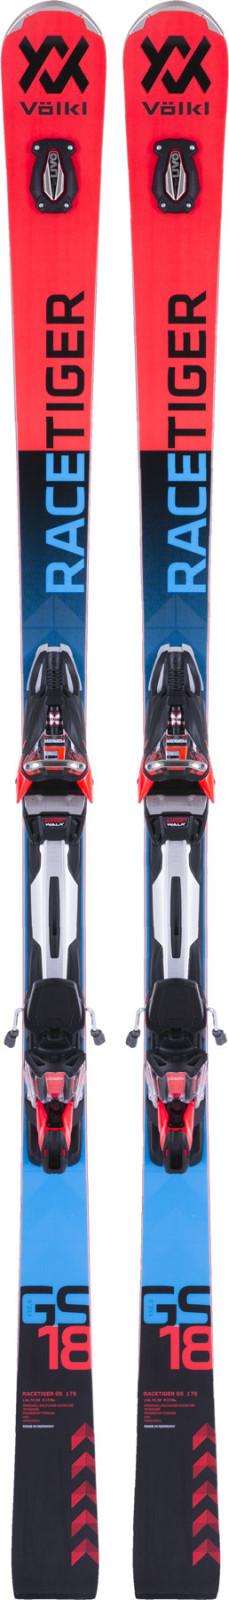 Völkl Racetiger GS + rMotion2 12 GW Race